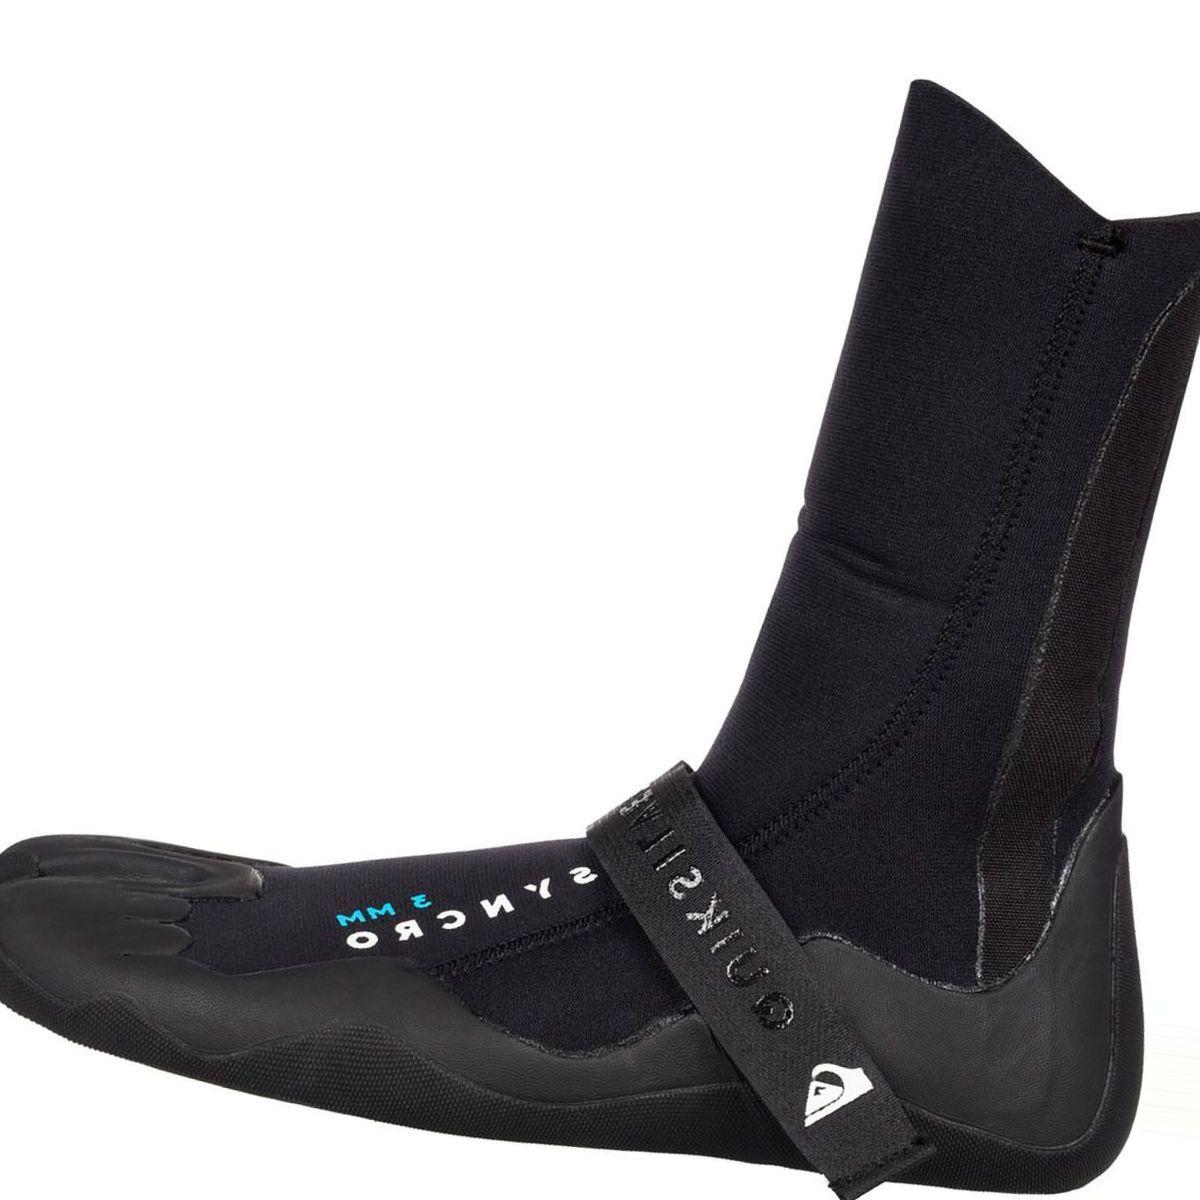 Quiksilver Syncro 3.0mm Split Toe Boot - Men's